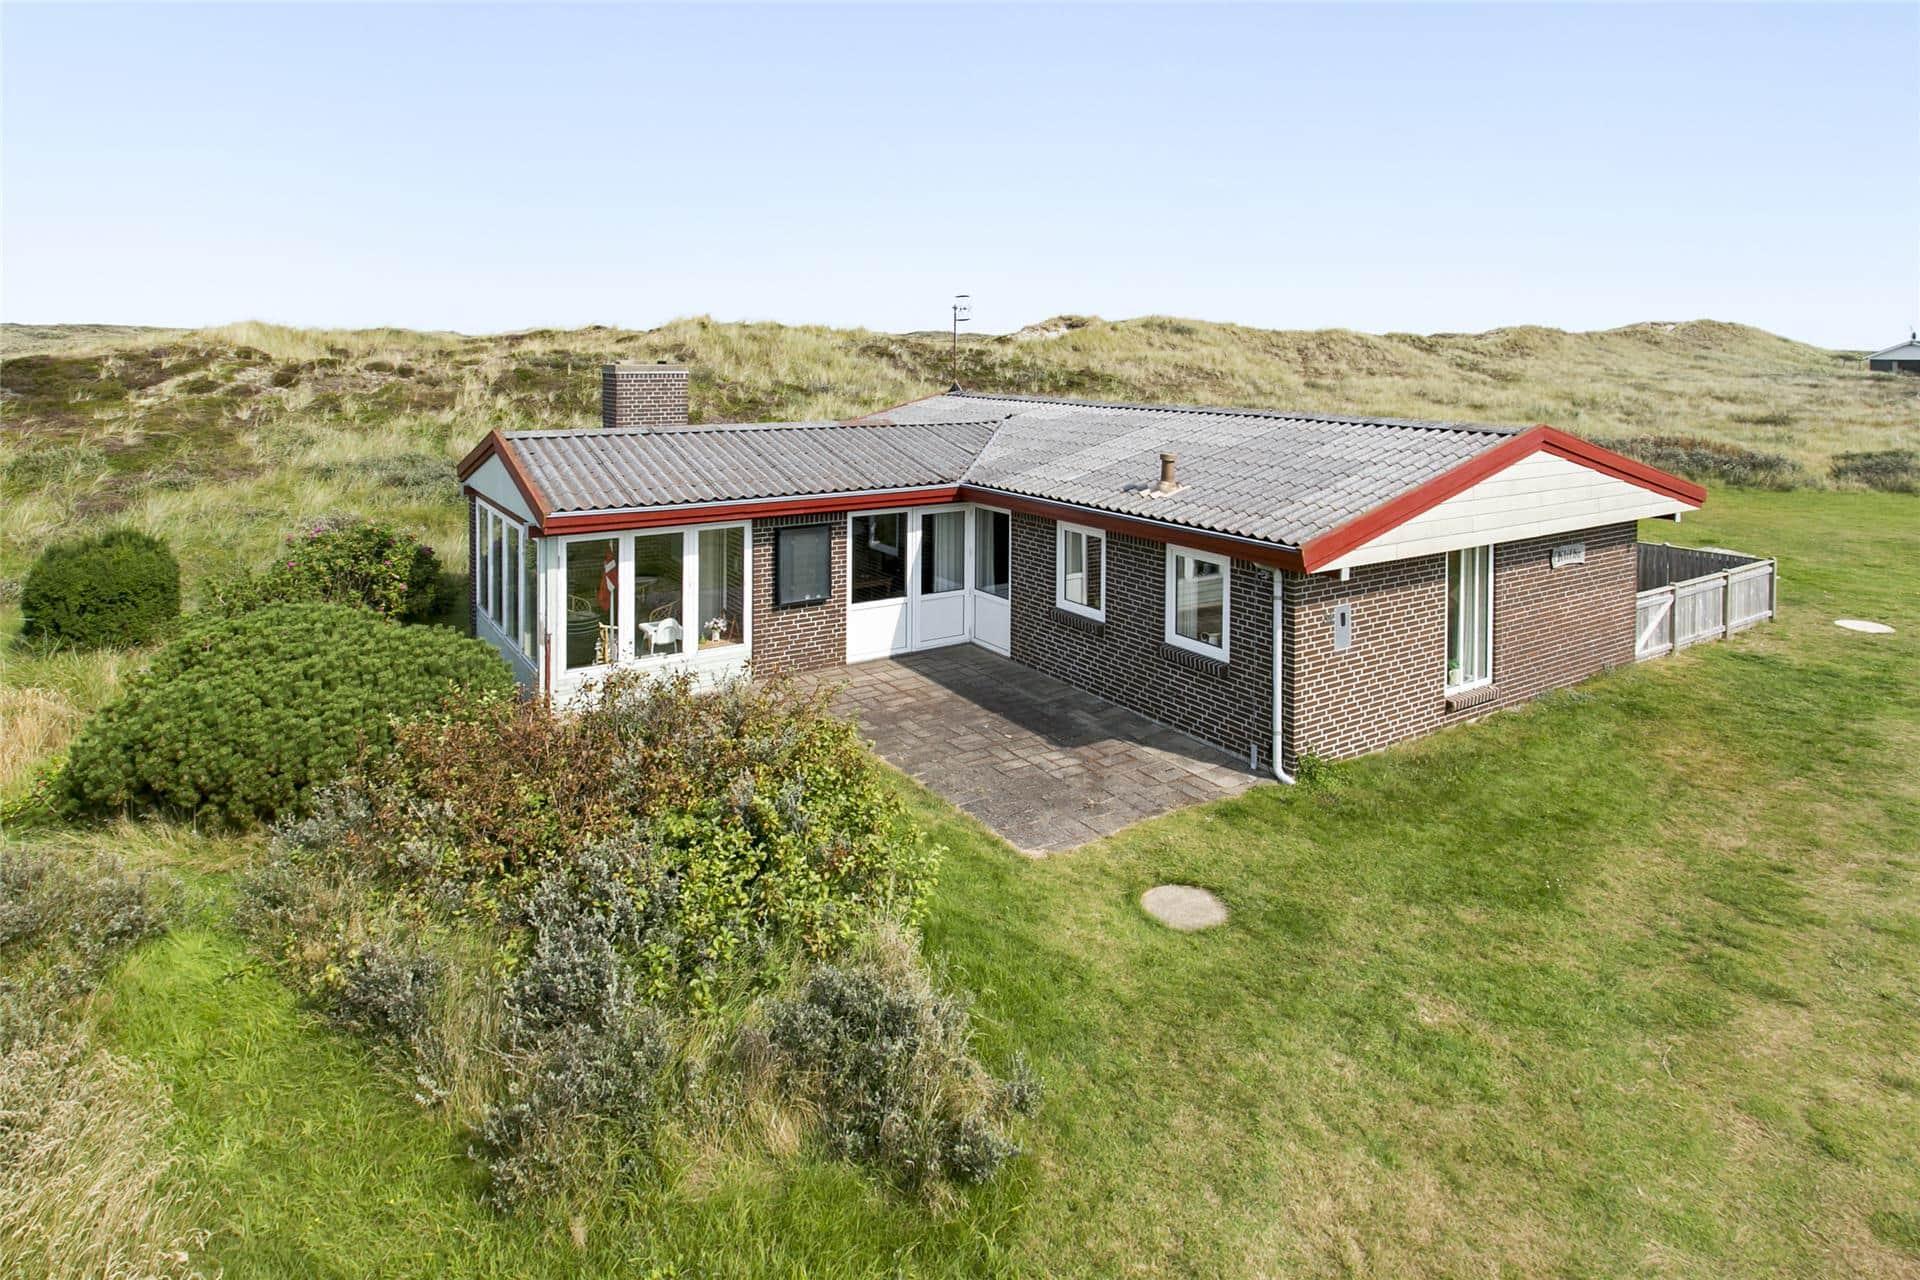 Billede 1-13 Sommerhus 554, Pighvarvej 34, DK - 7700 Thisted